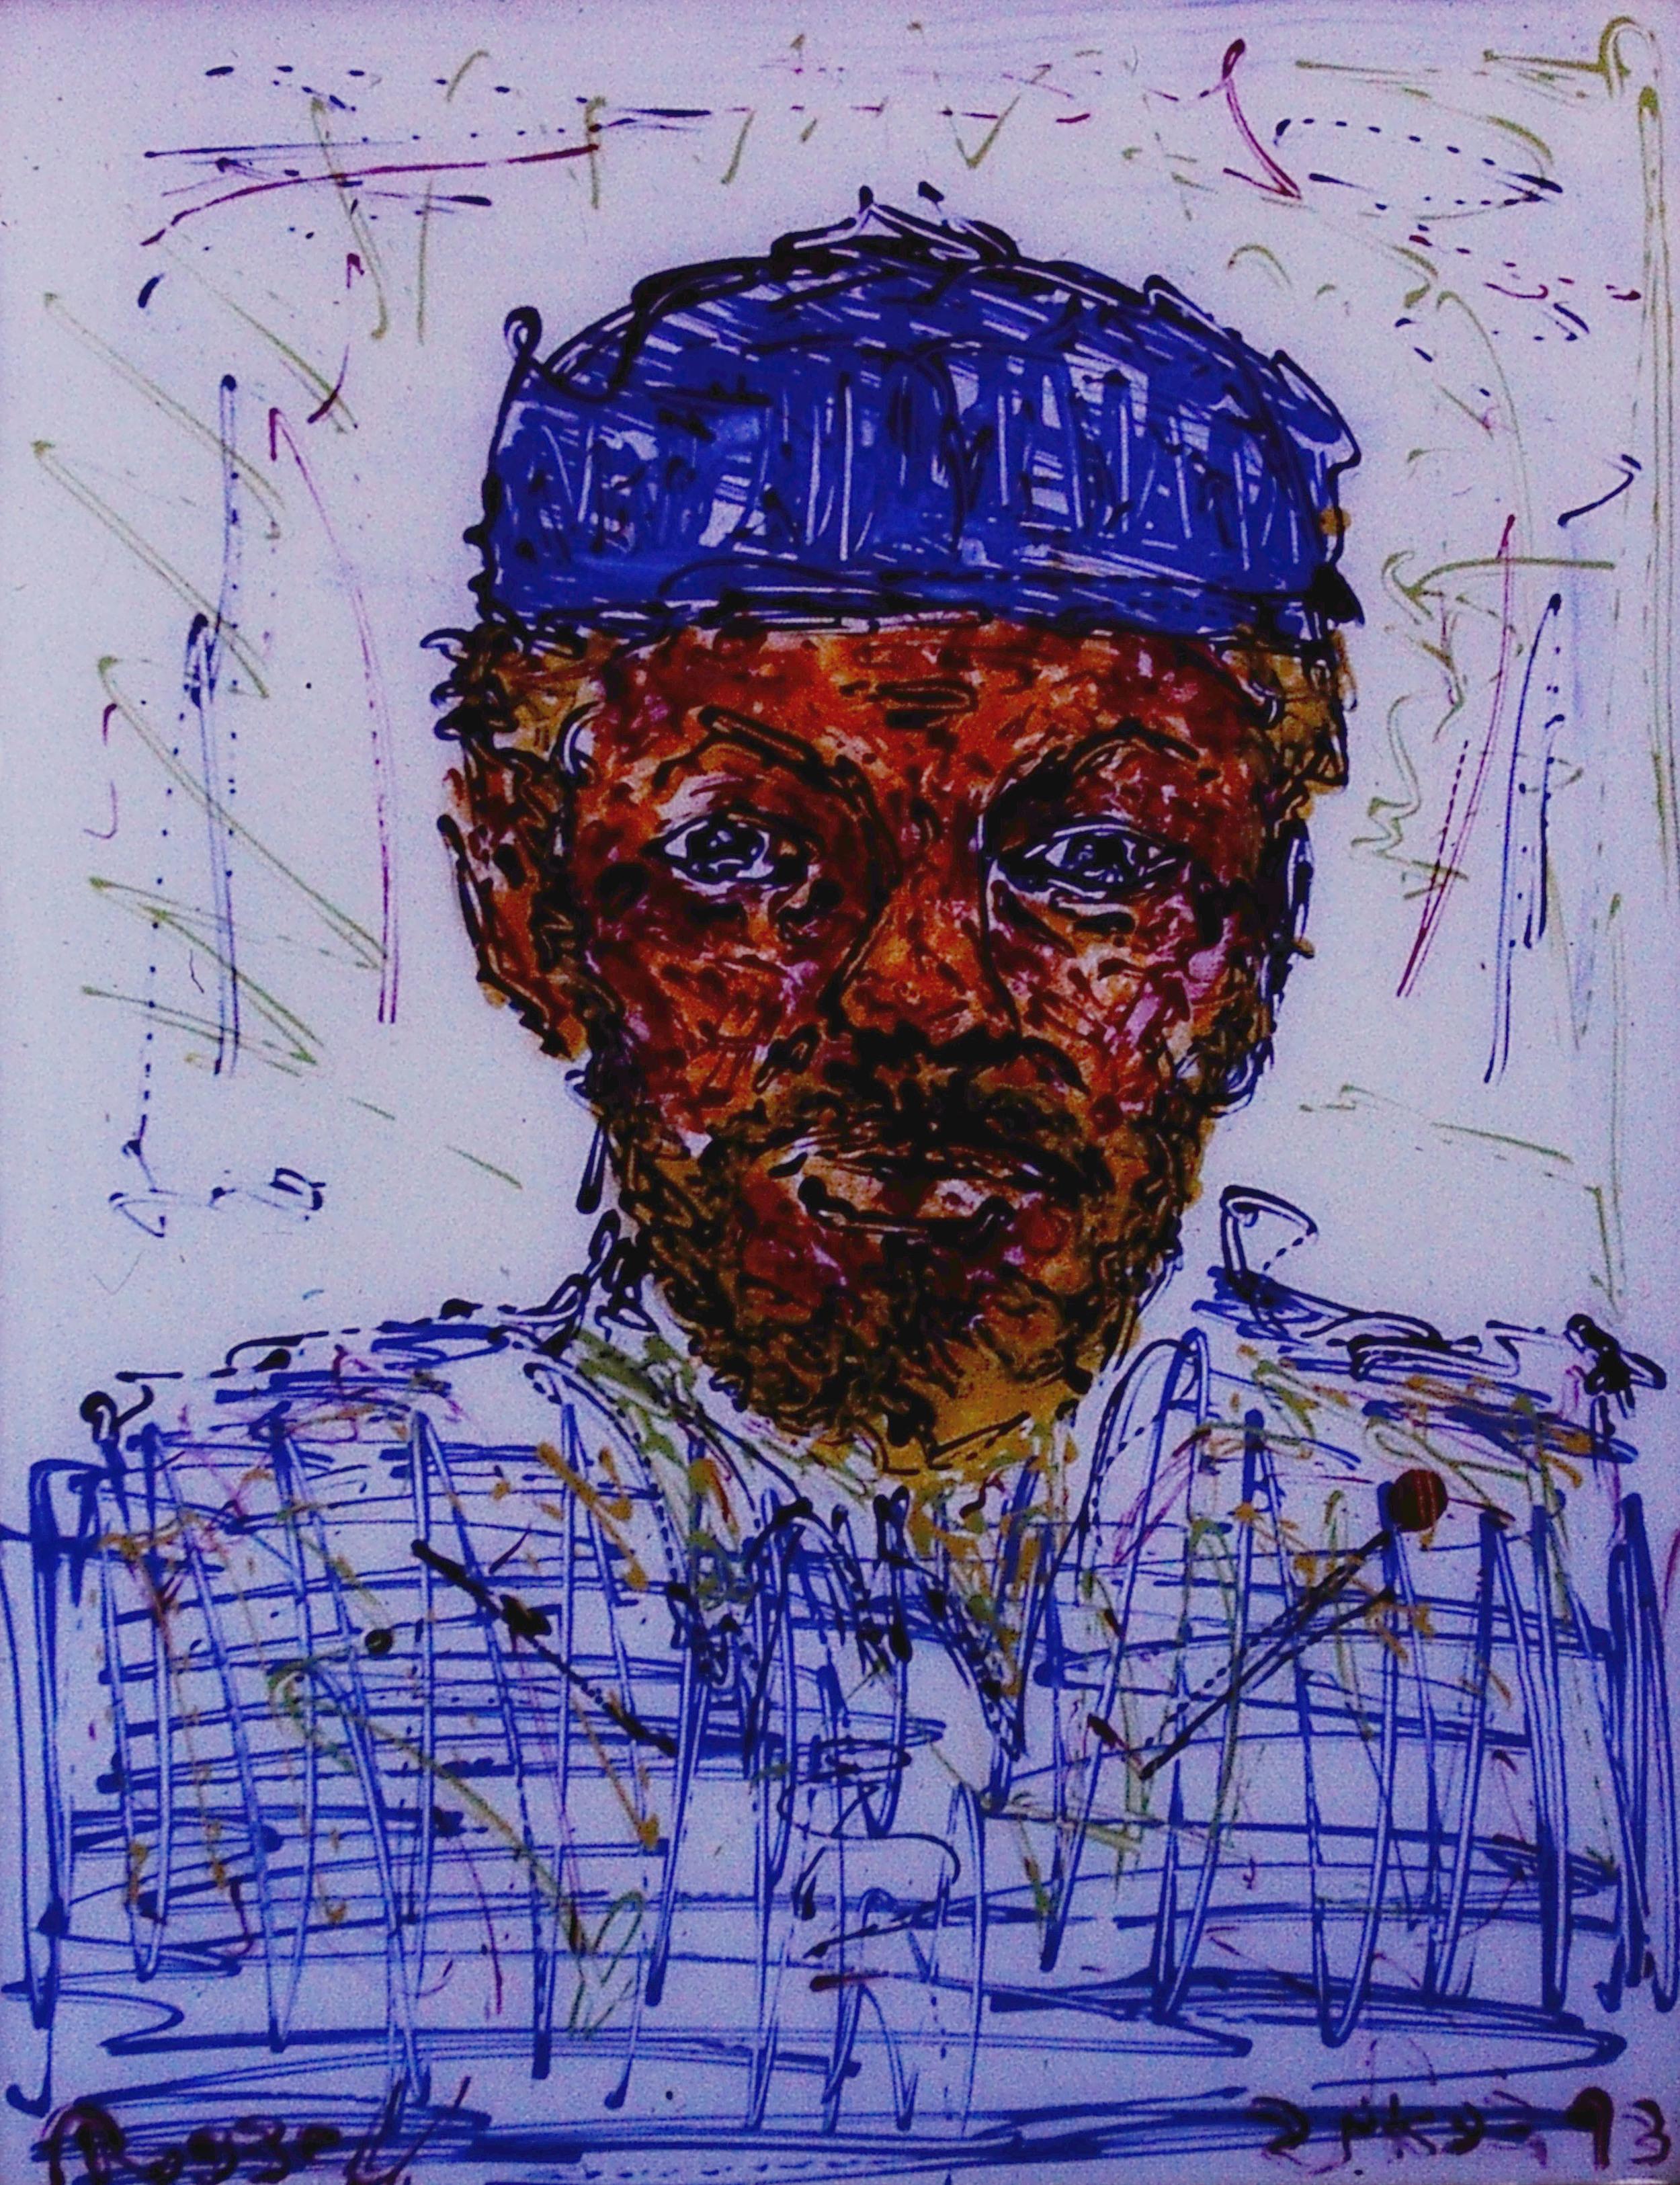 Self Portrait on Glass 1993